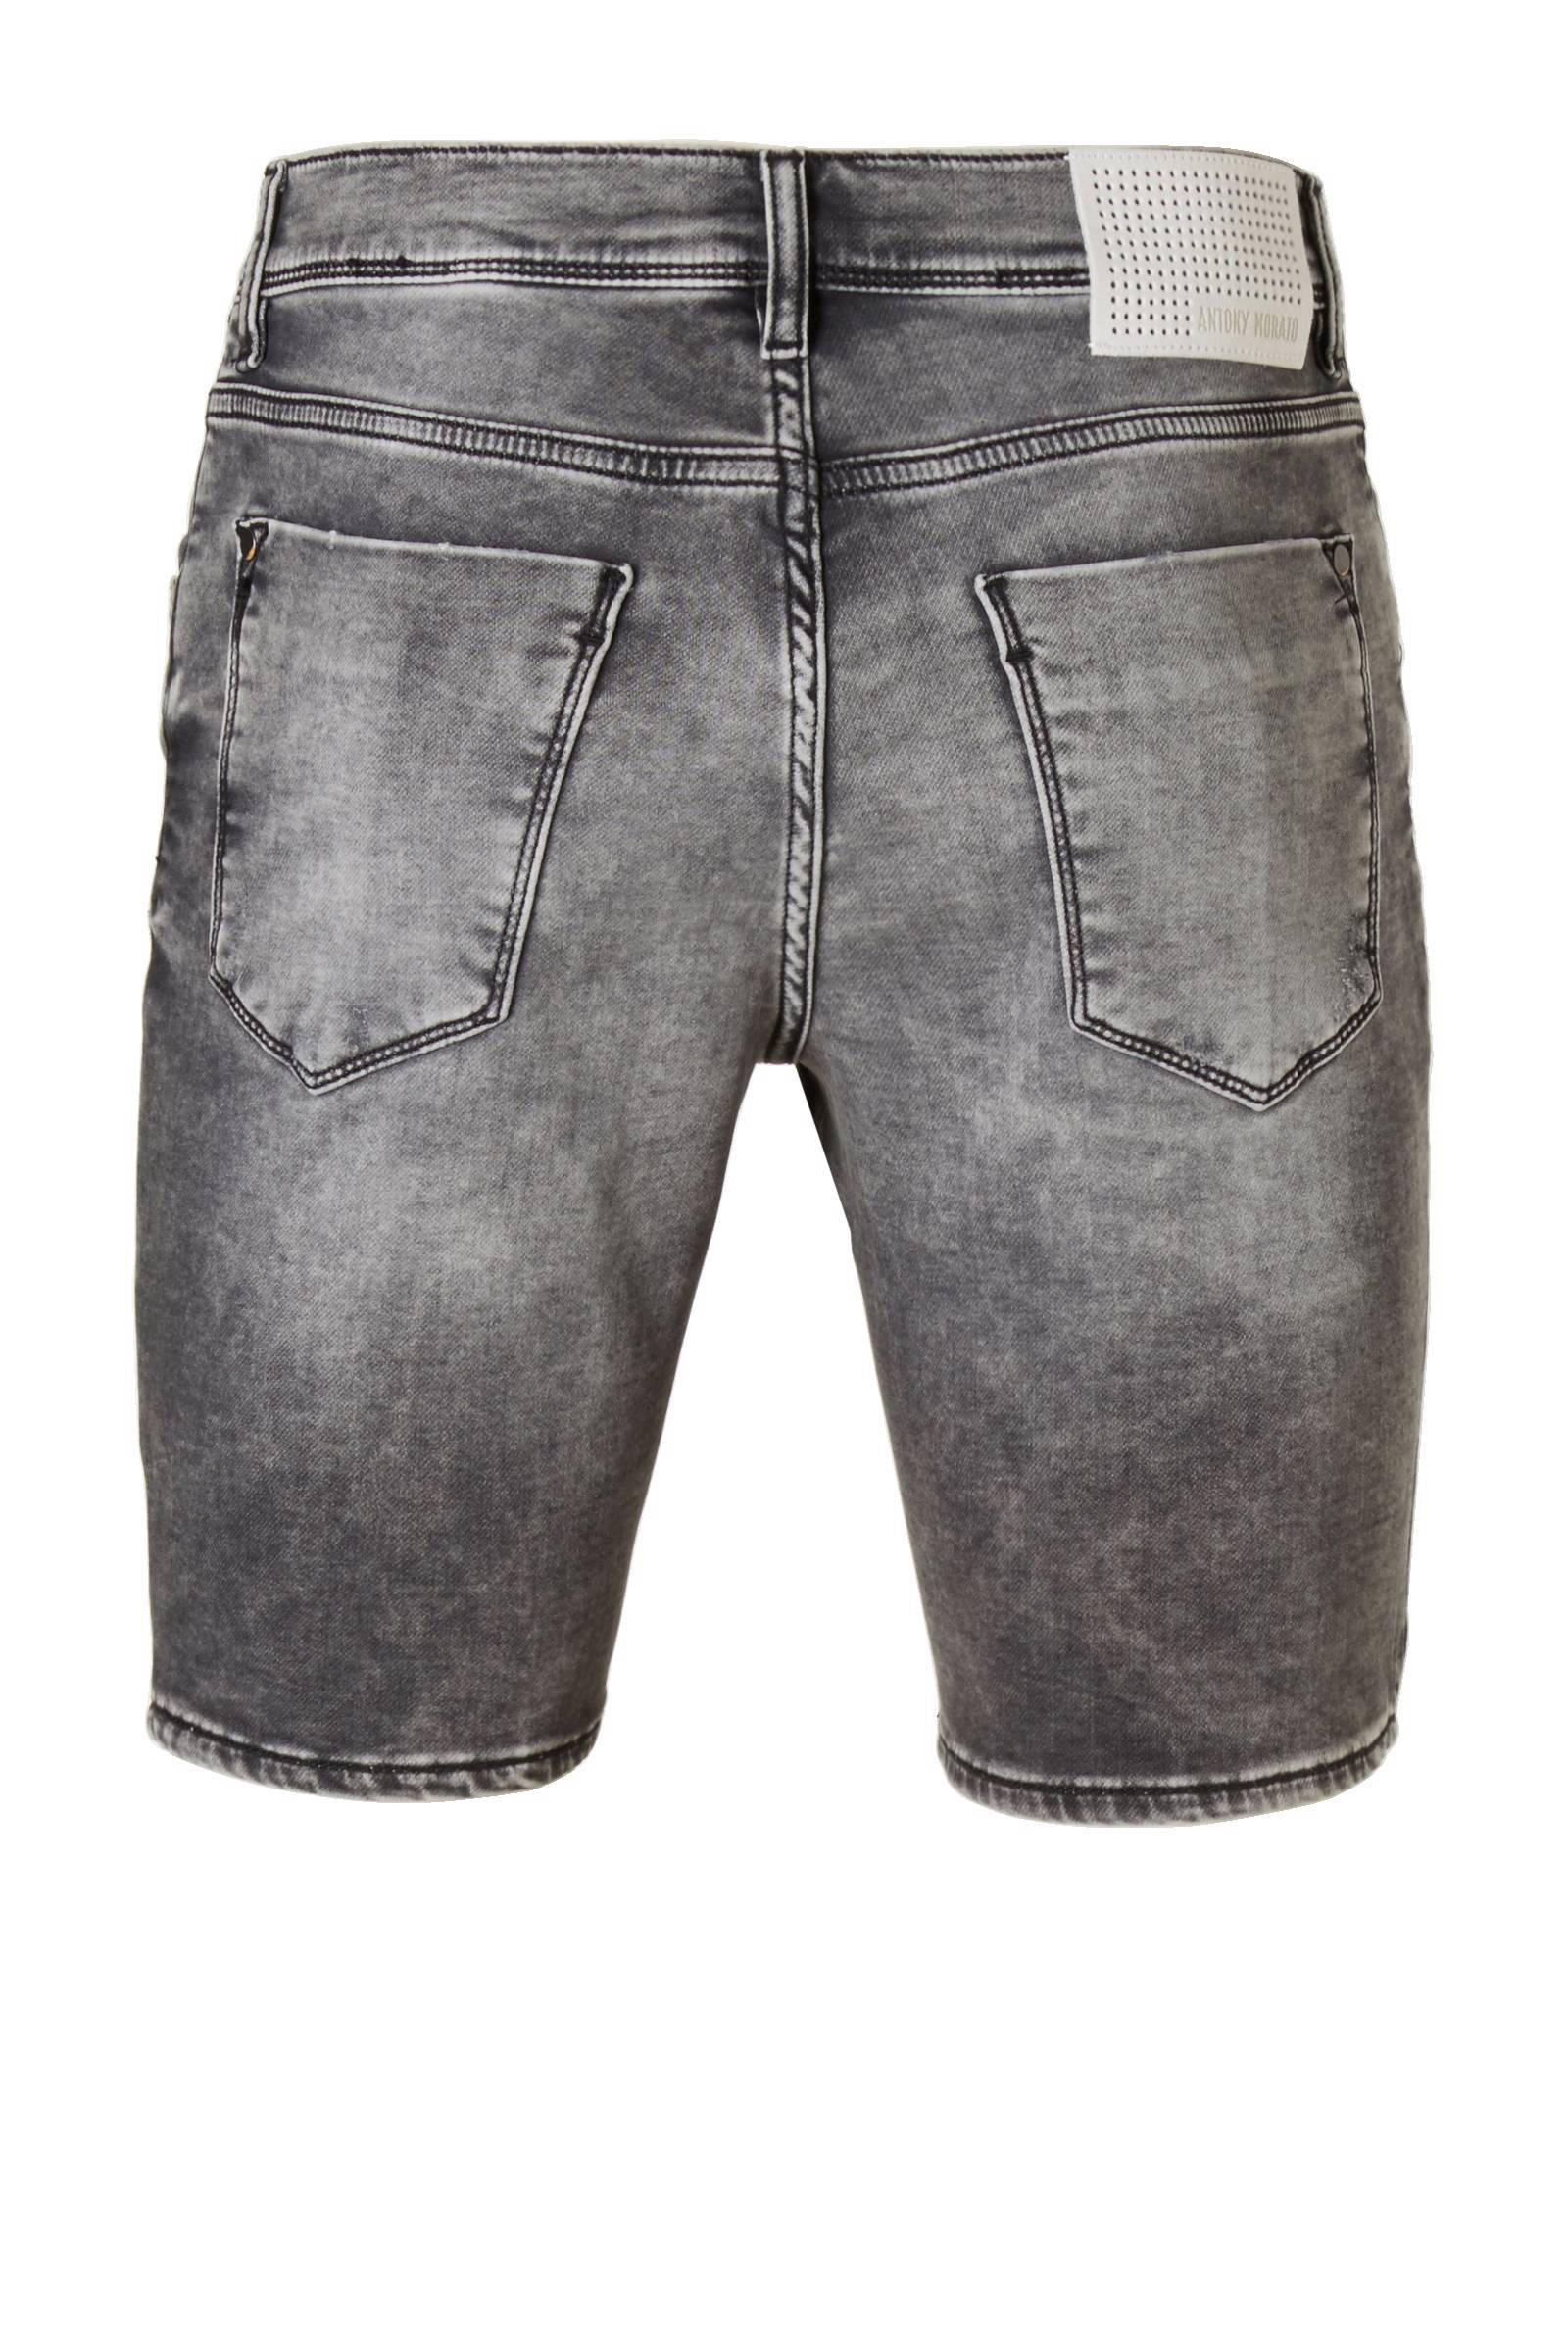 Antony Morato skinny jeans short Barret jog | wehkamp